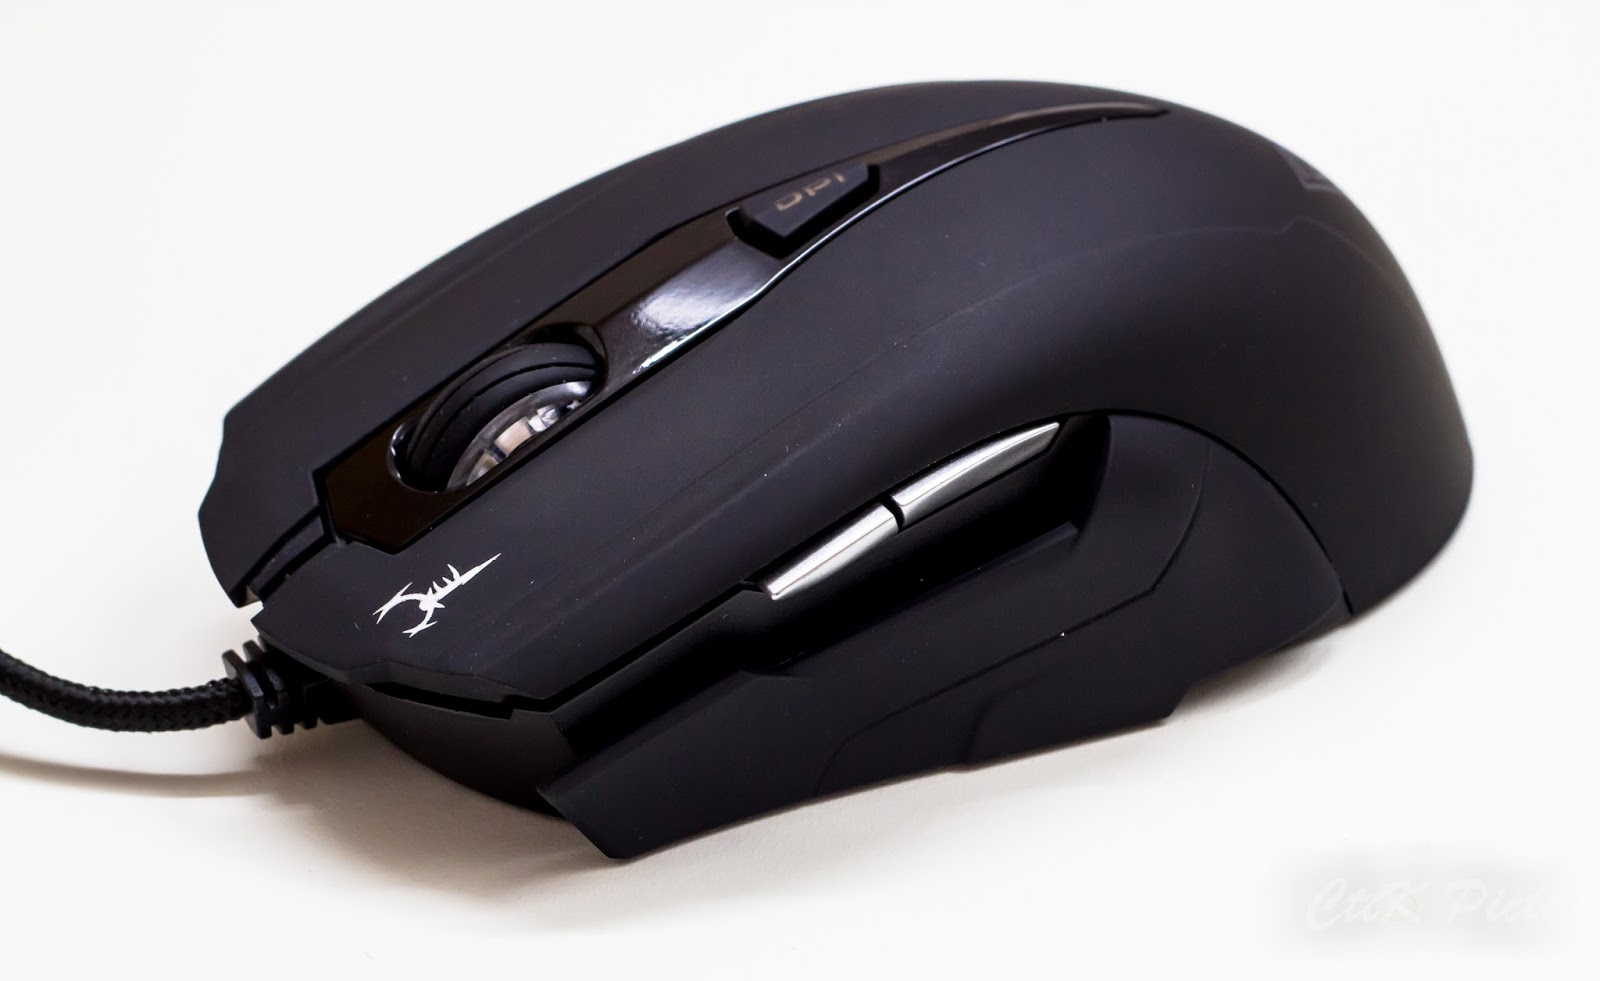 Gamdias Hades Extension Optical Gaming Mouse 59